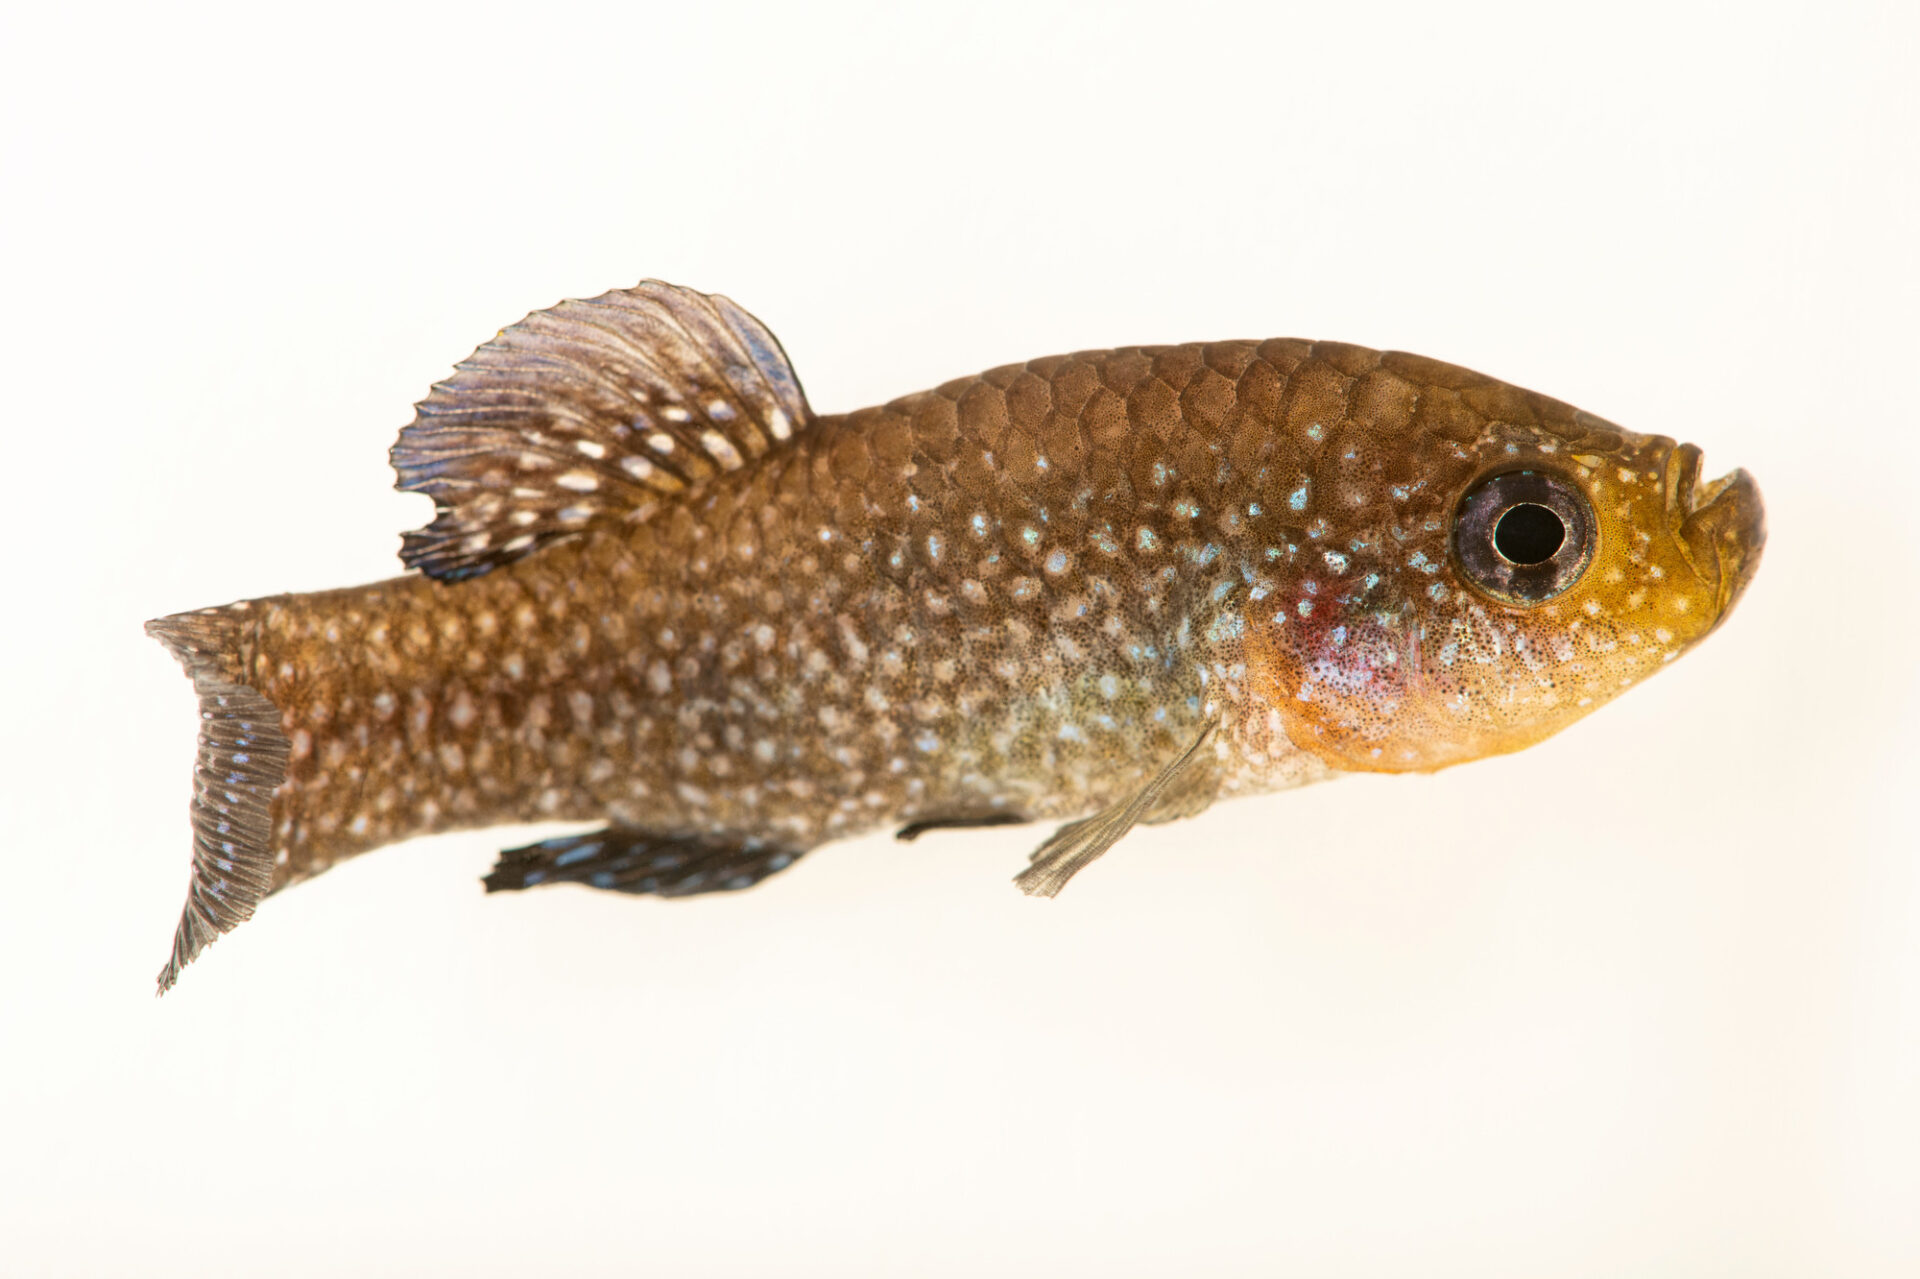 Photo: A pearl-spotted killifish (Aphanius mento) at Aquarium Berlin.